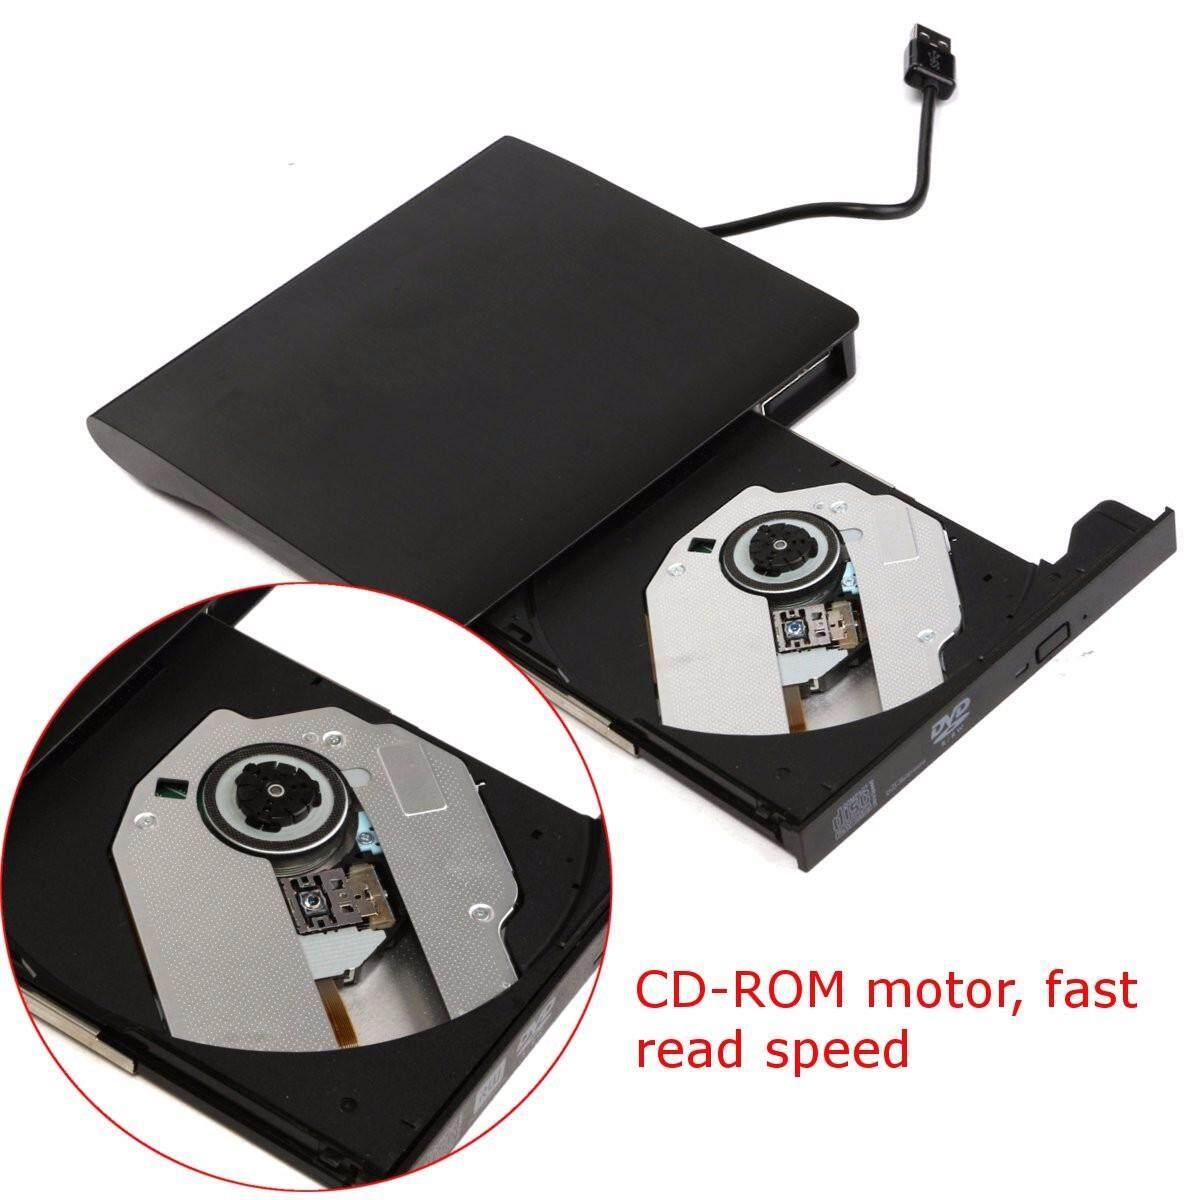 【Free Shipping + Flash Deal】External USB3.0 DVD/CD RW Drive Reader Writer Burner For Notebook Laptop PC